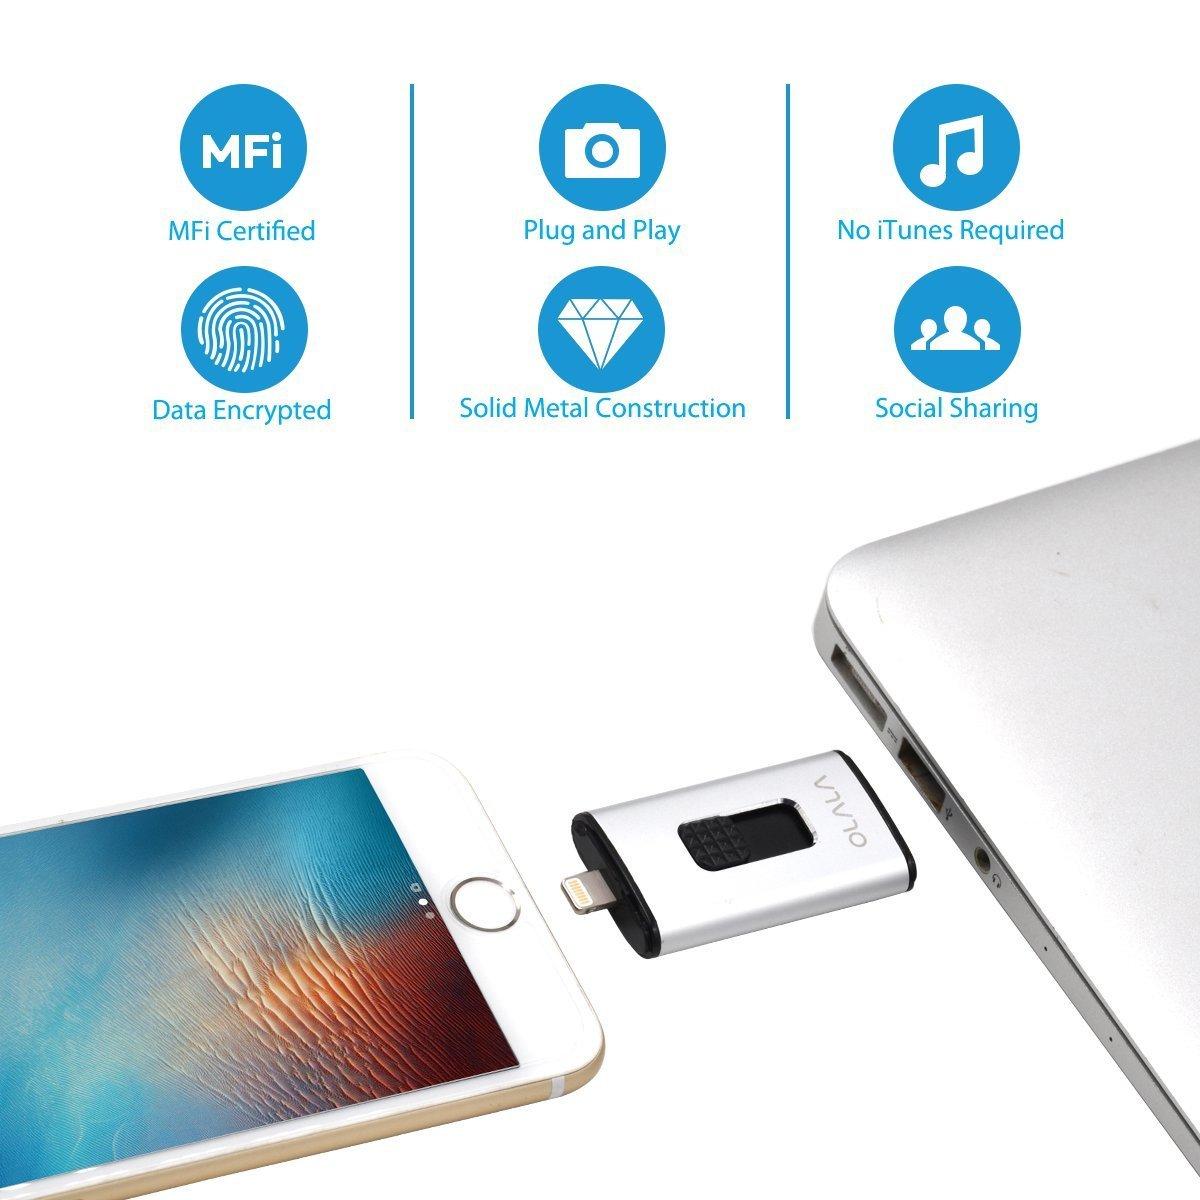 iPhone Lightning Flash Drive, OLALA 32GB USB 3.0 Memory Stick Thumb Pen Drive Jump Drive IOS External Storage Expansion for iPhone iPad Mac iOS PC Laptops[Apple MFI Certified] (Silver)